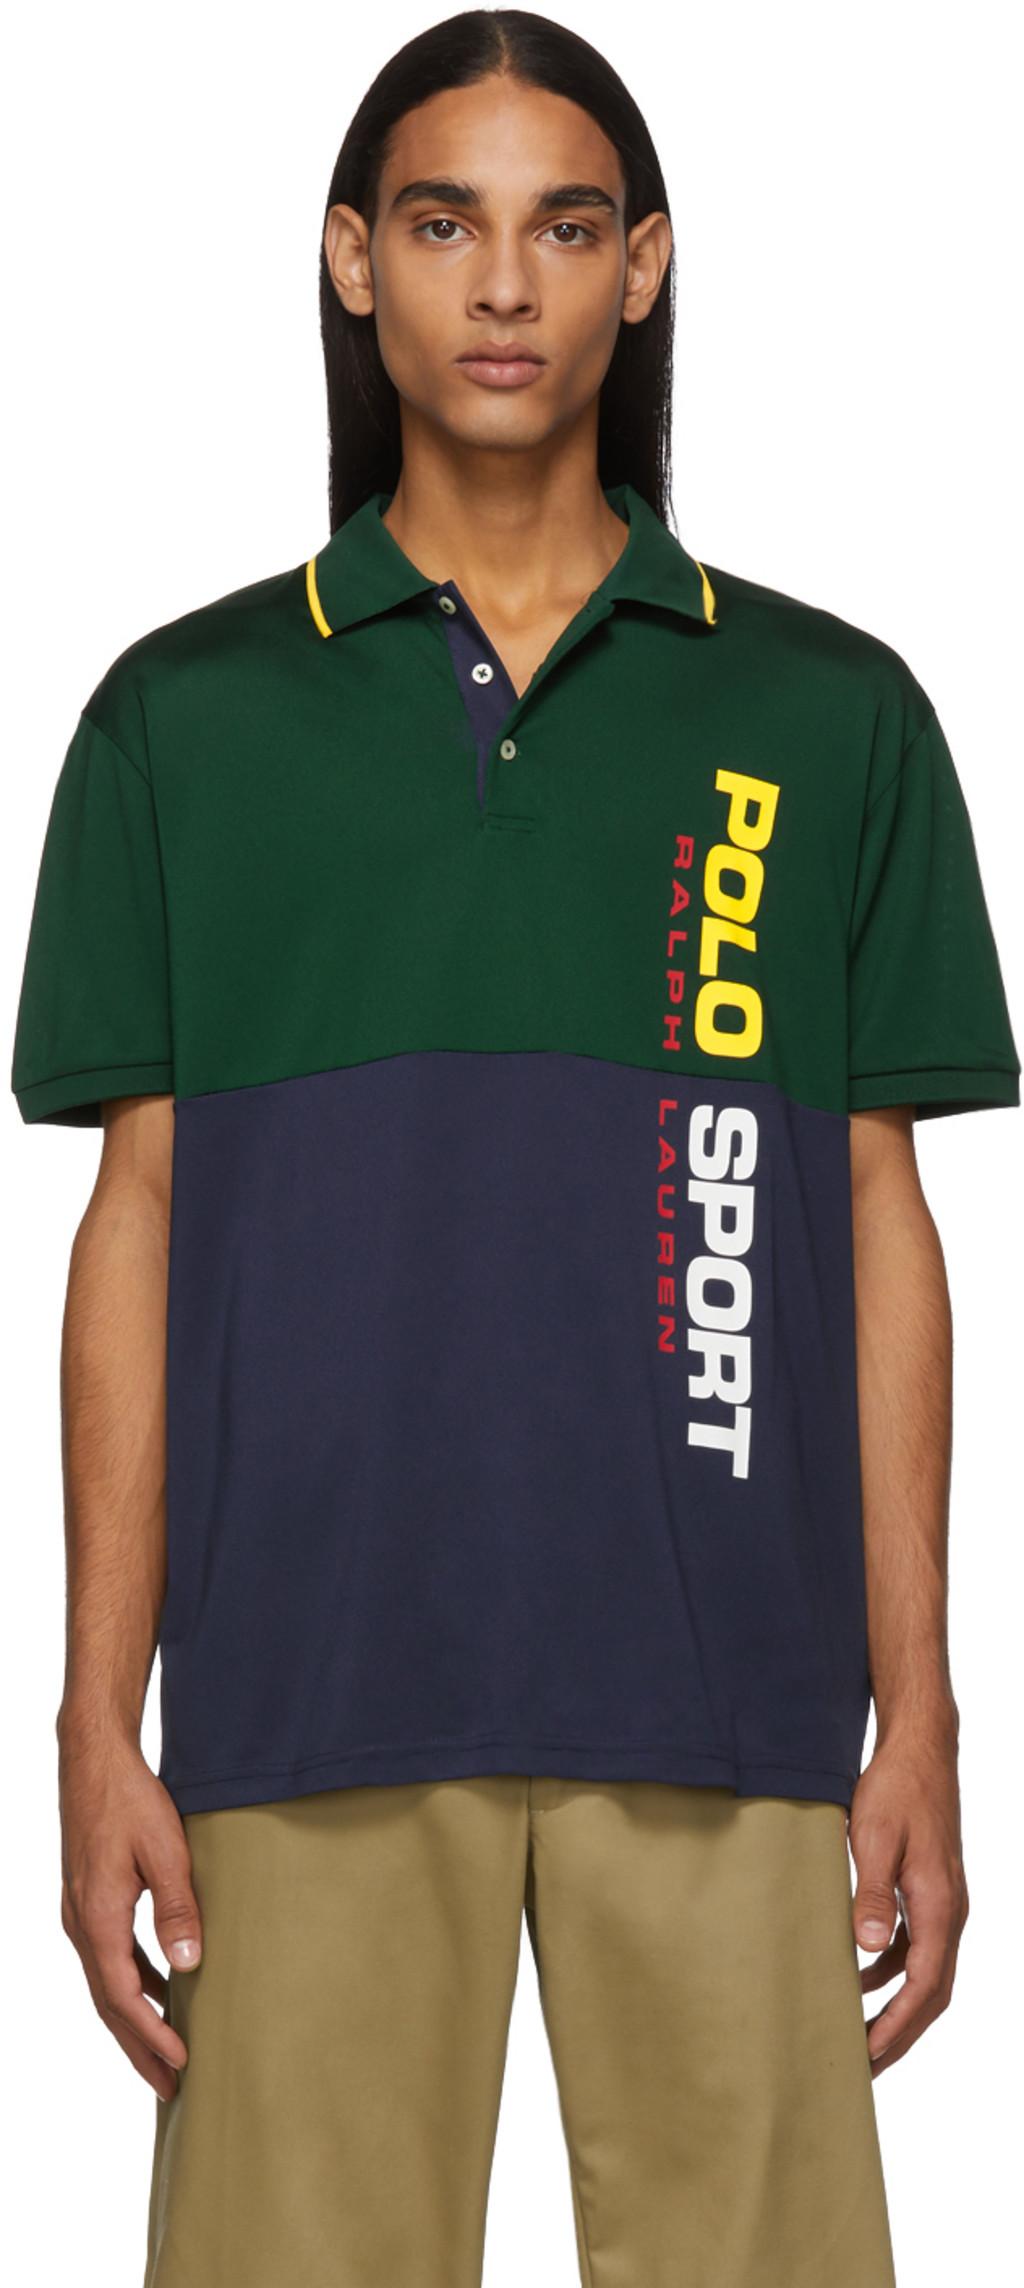 Green & Navy Stretch Mesh Polo